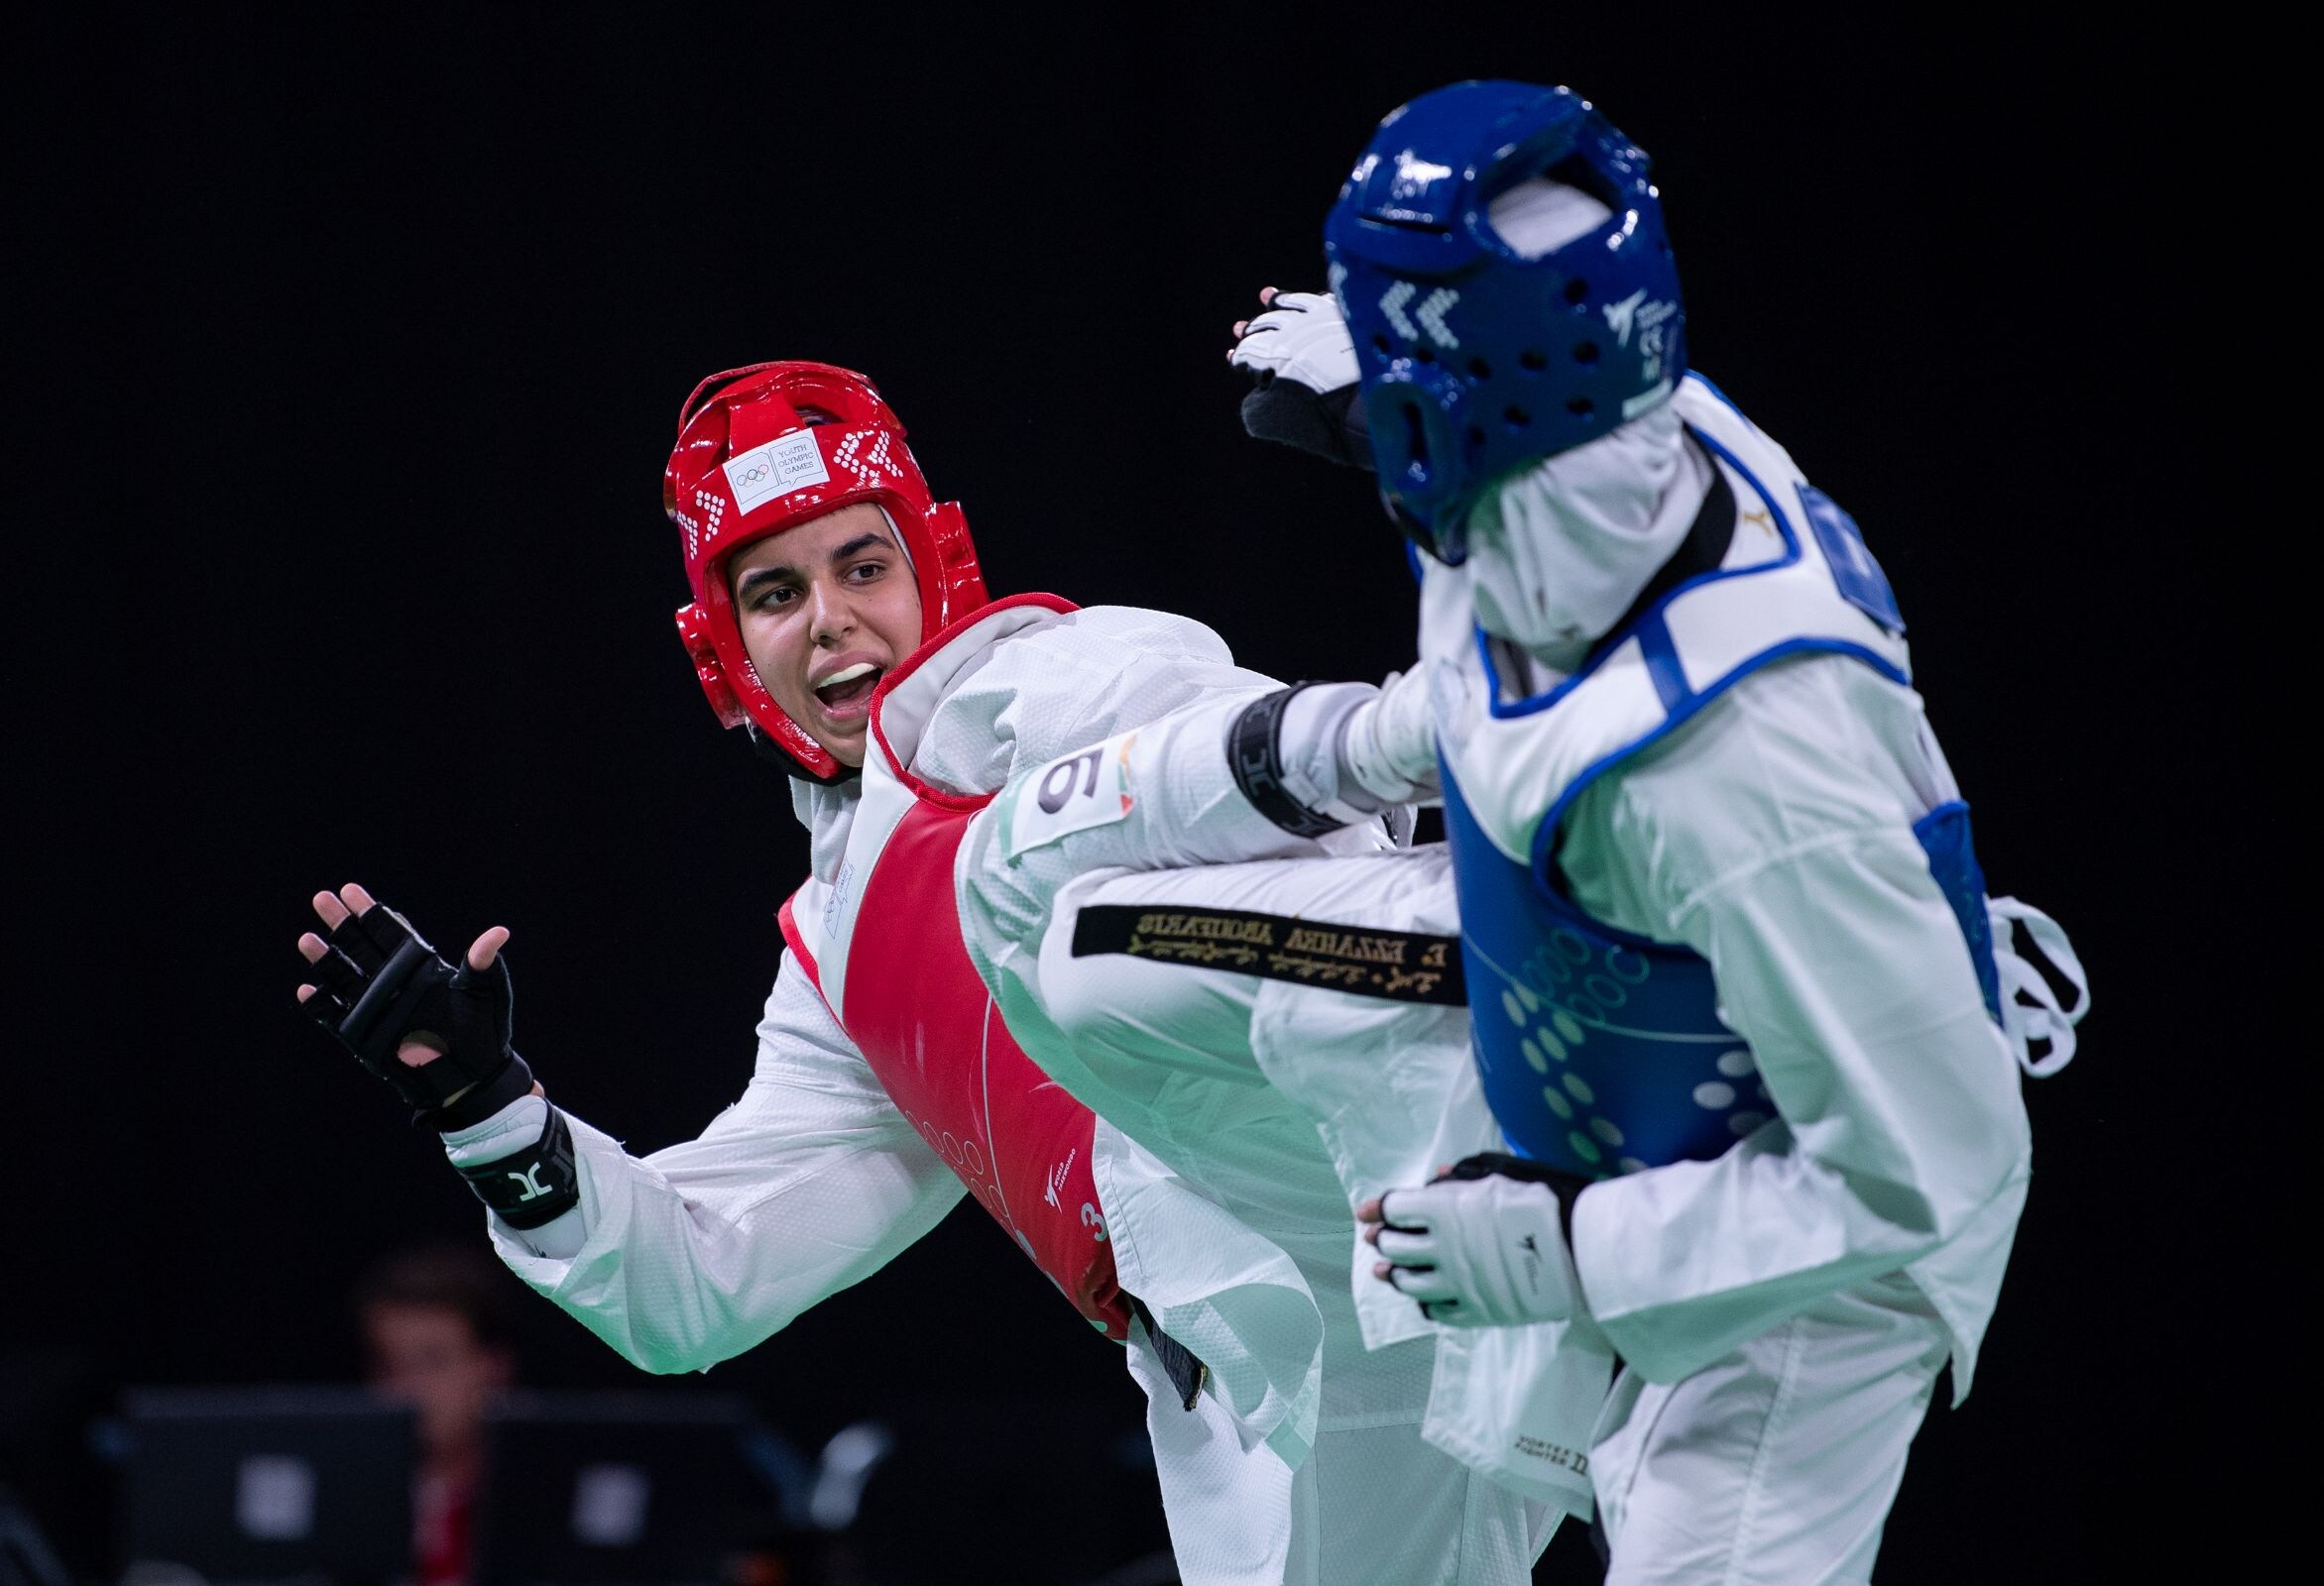 Buenos Aires 2018 - Taekwondo - Women's +63kg